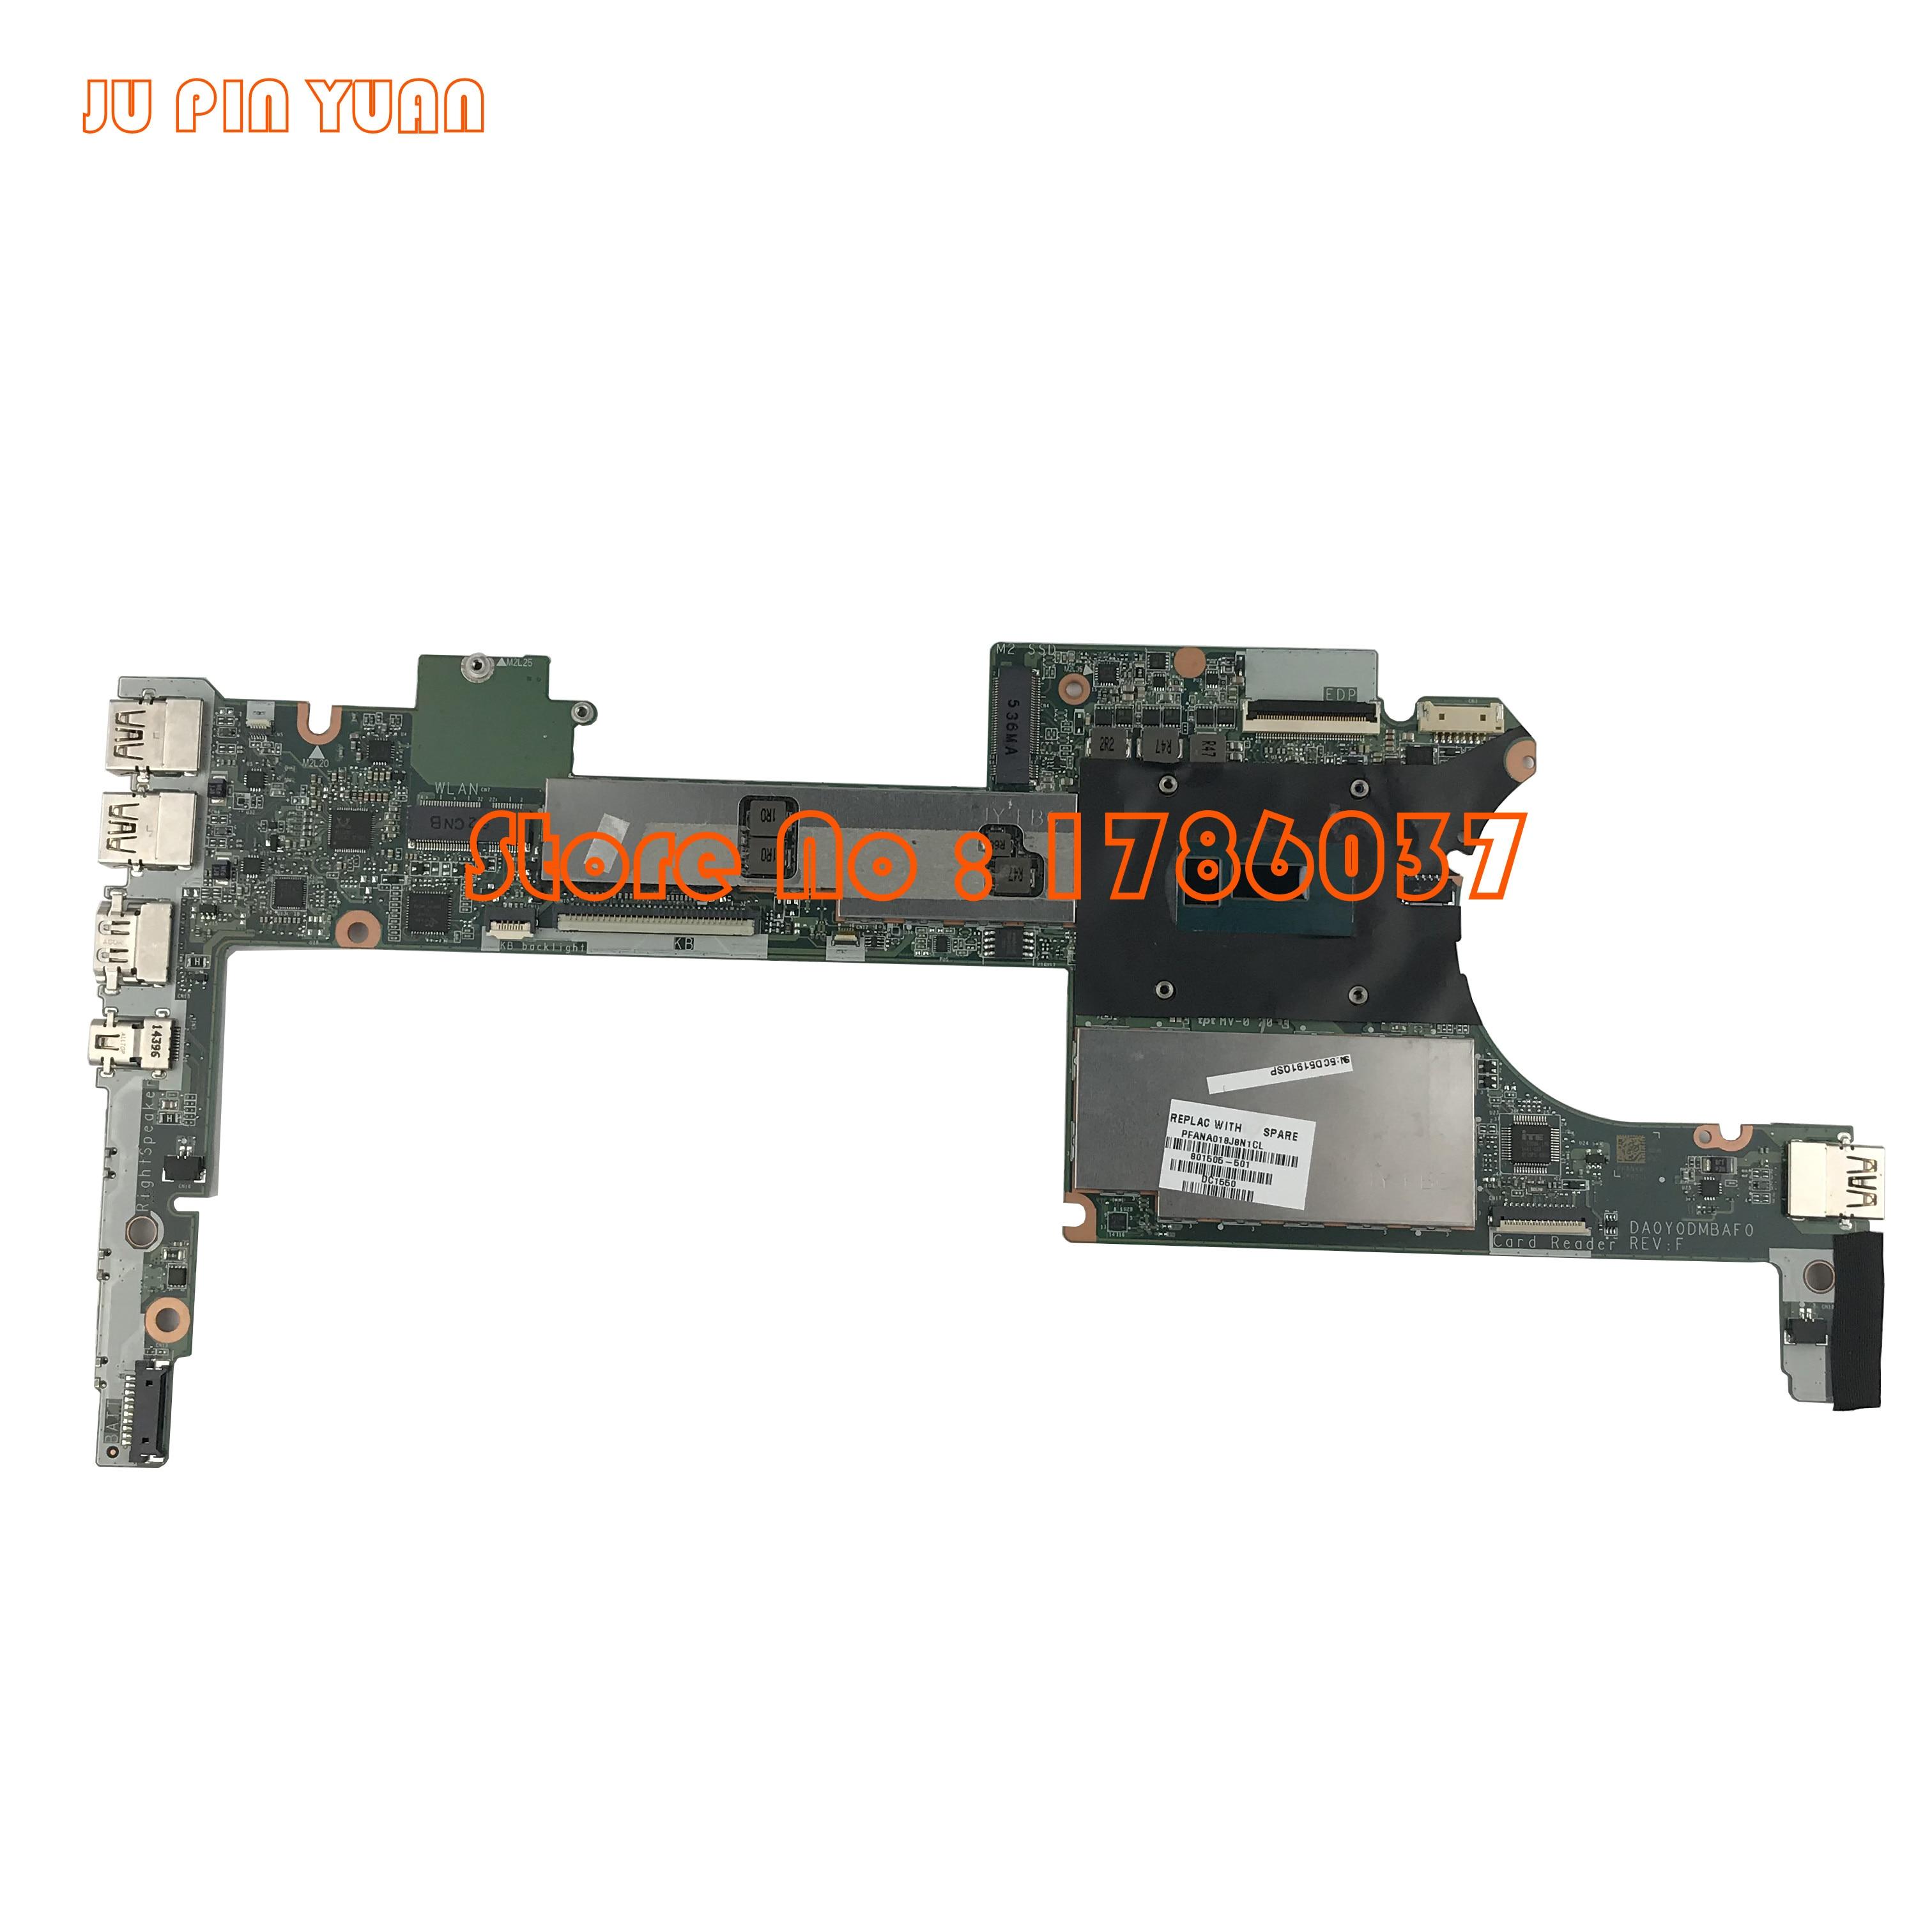 JU PIN YUAN 801505 501 801505 001 For HP Spectre X360 G1 13 4003DX Series Laptop